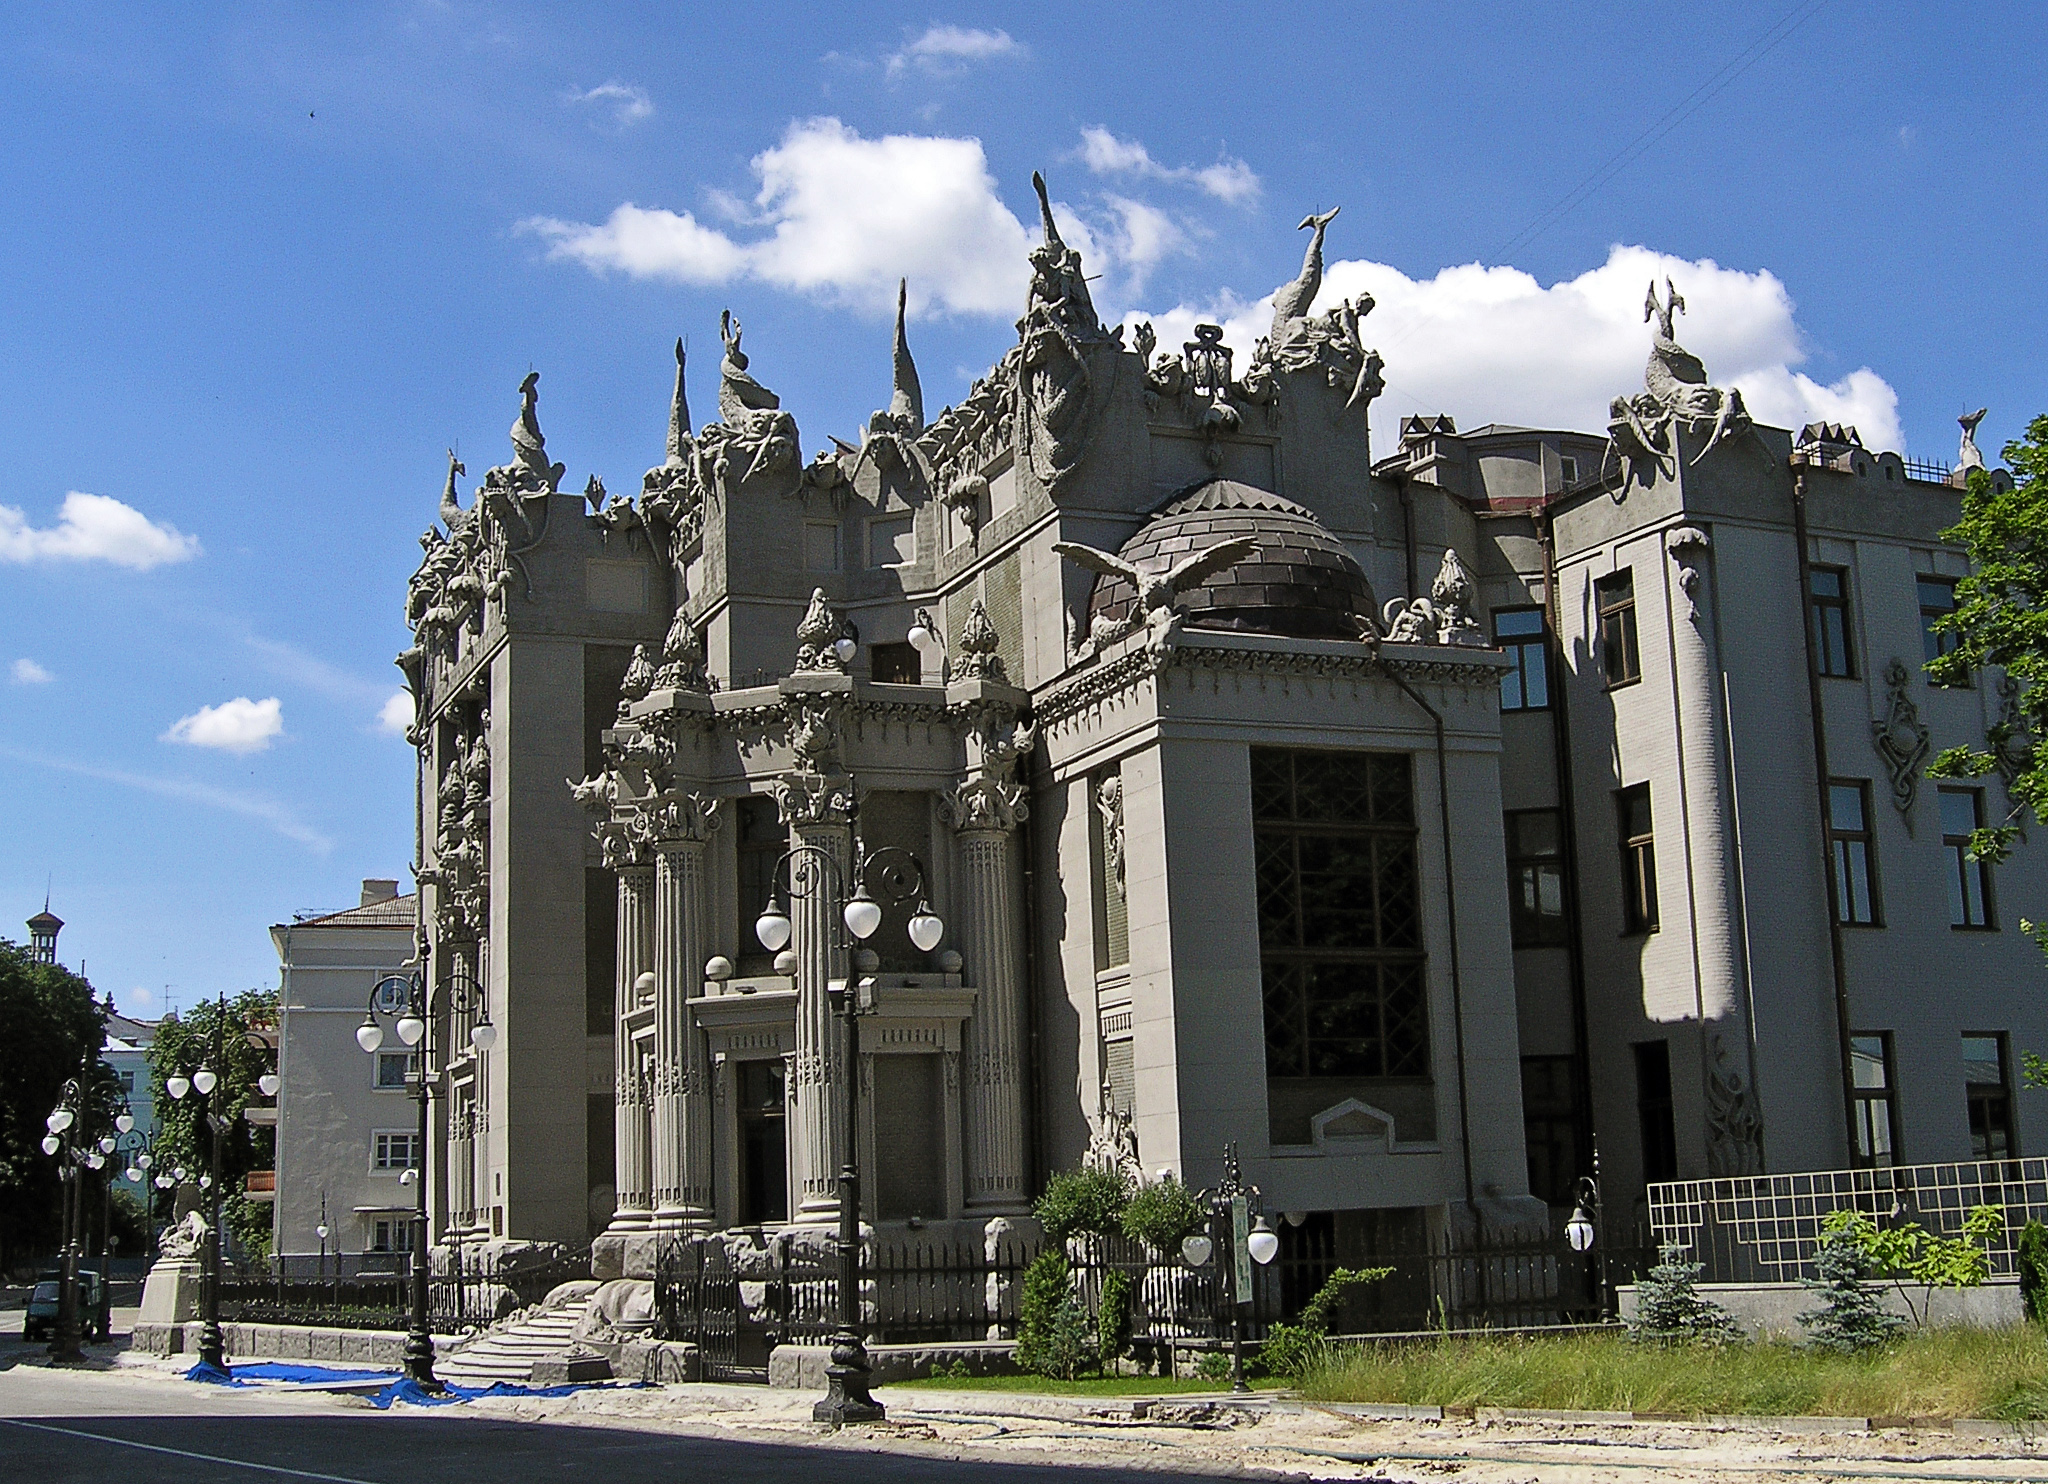 https://upload.wikimedia.org/wikipedia/commons/6/63/House_with_Chimaeras_RU.JPG